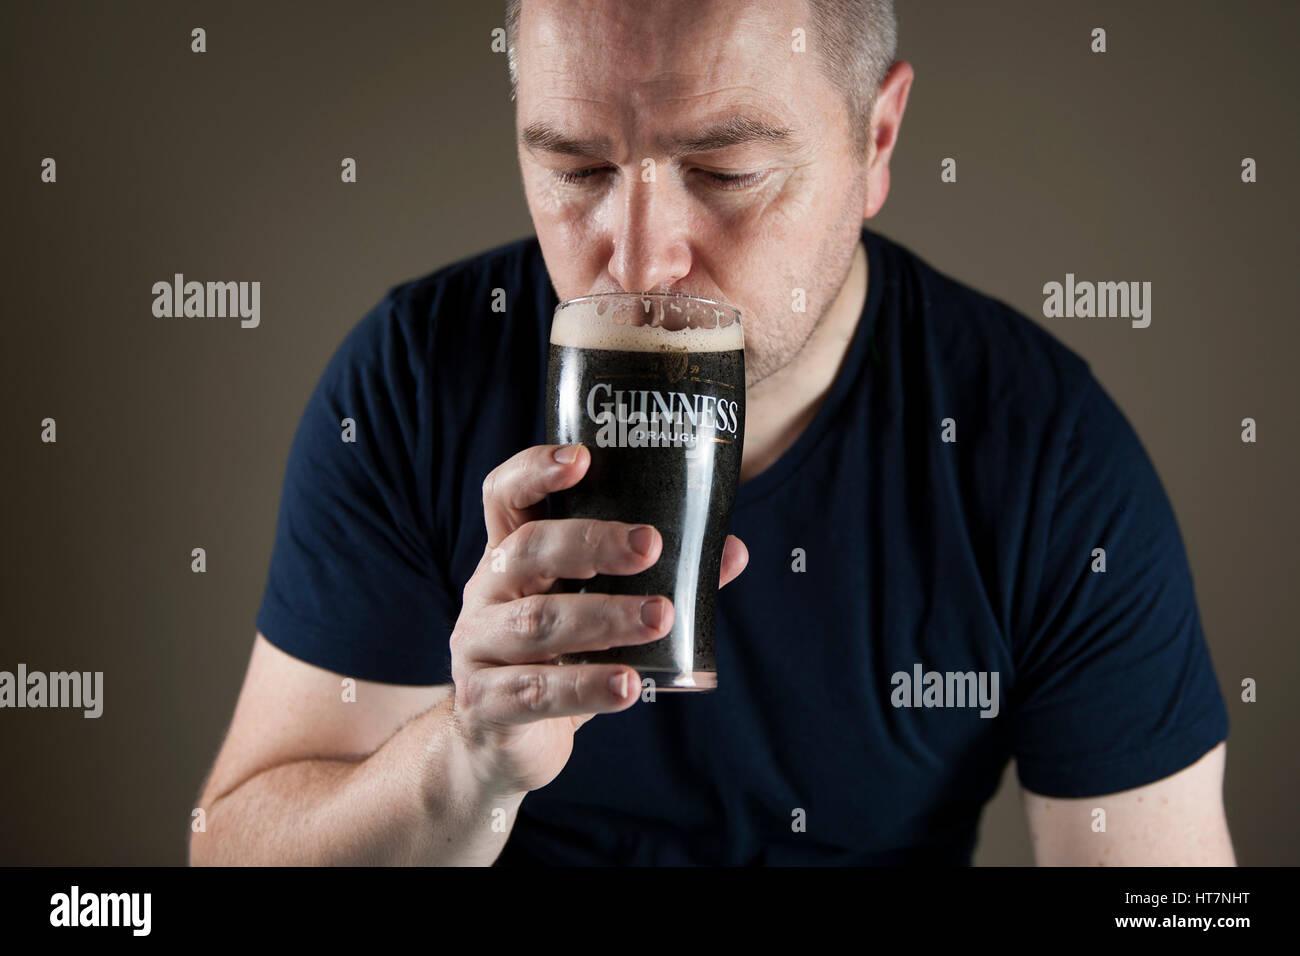 A closeup crop of a man drinking a pint of Irish Guinness stout - Stock Image